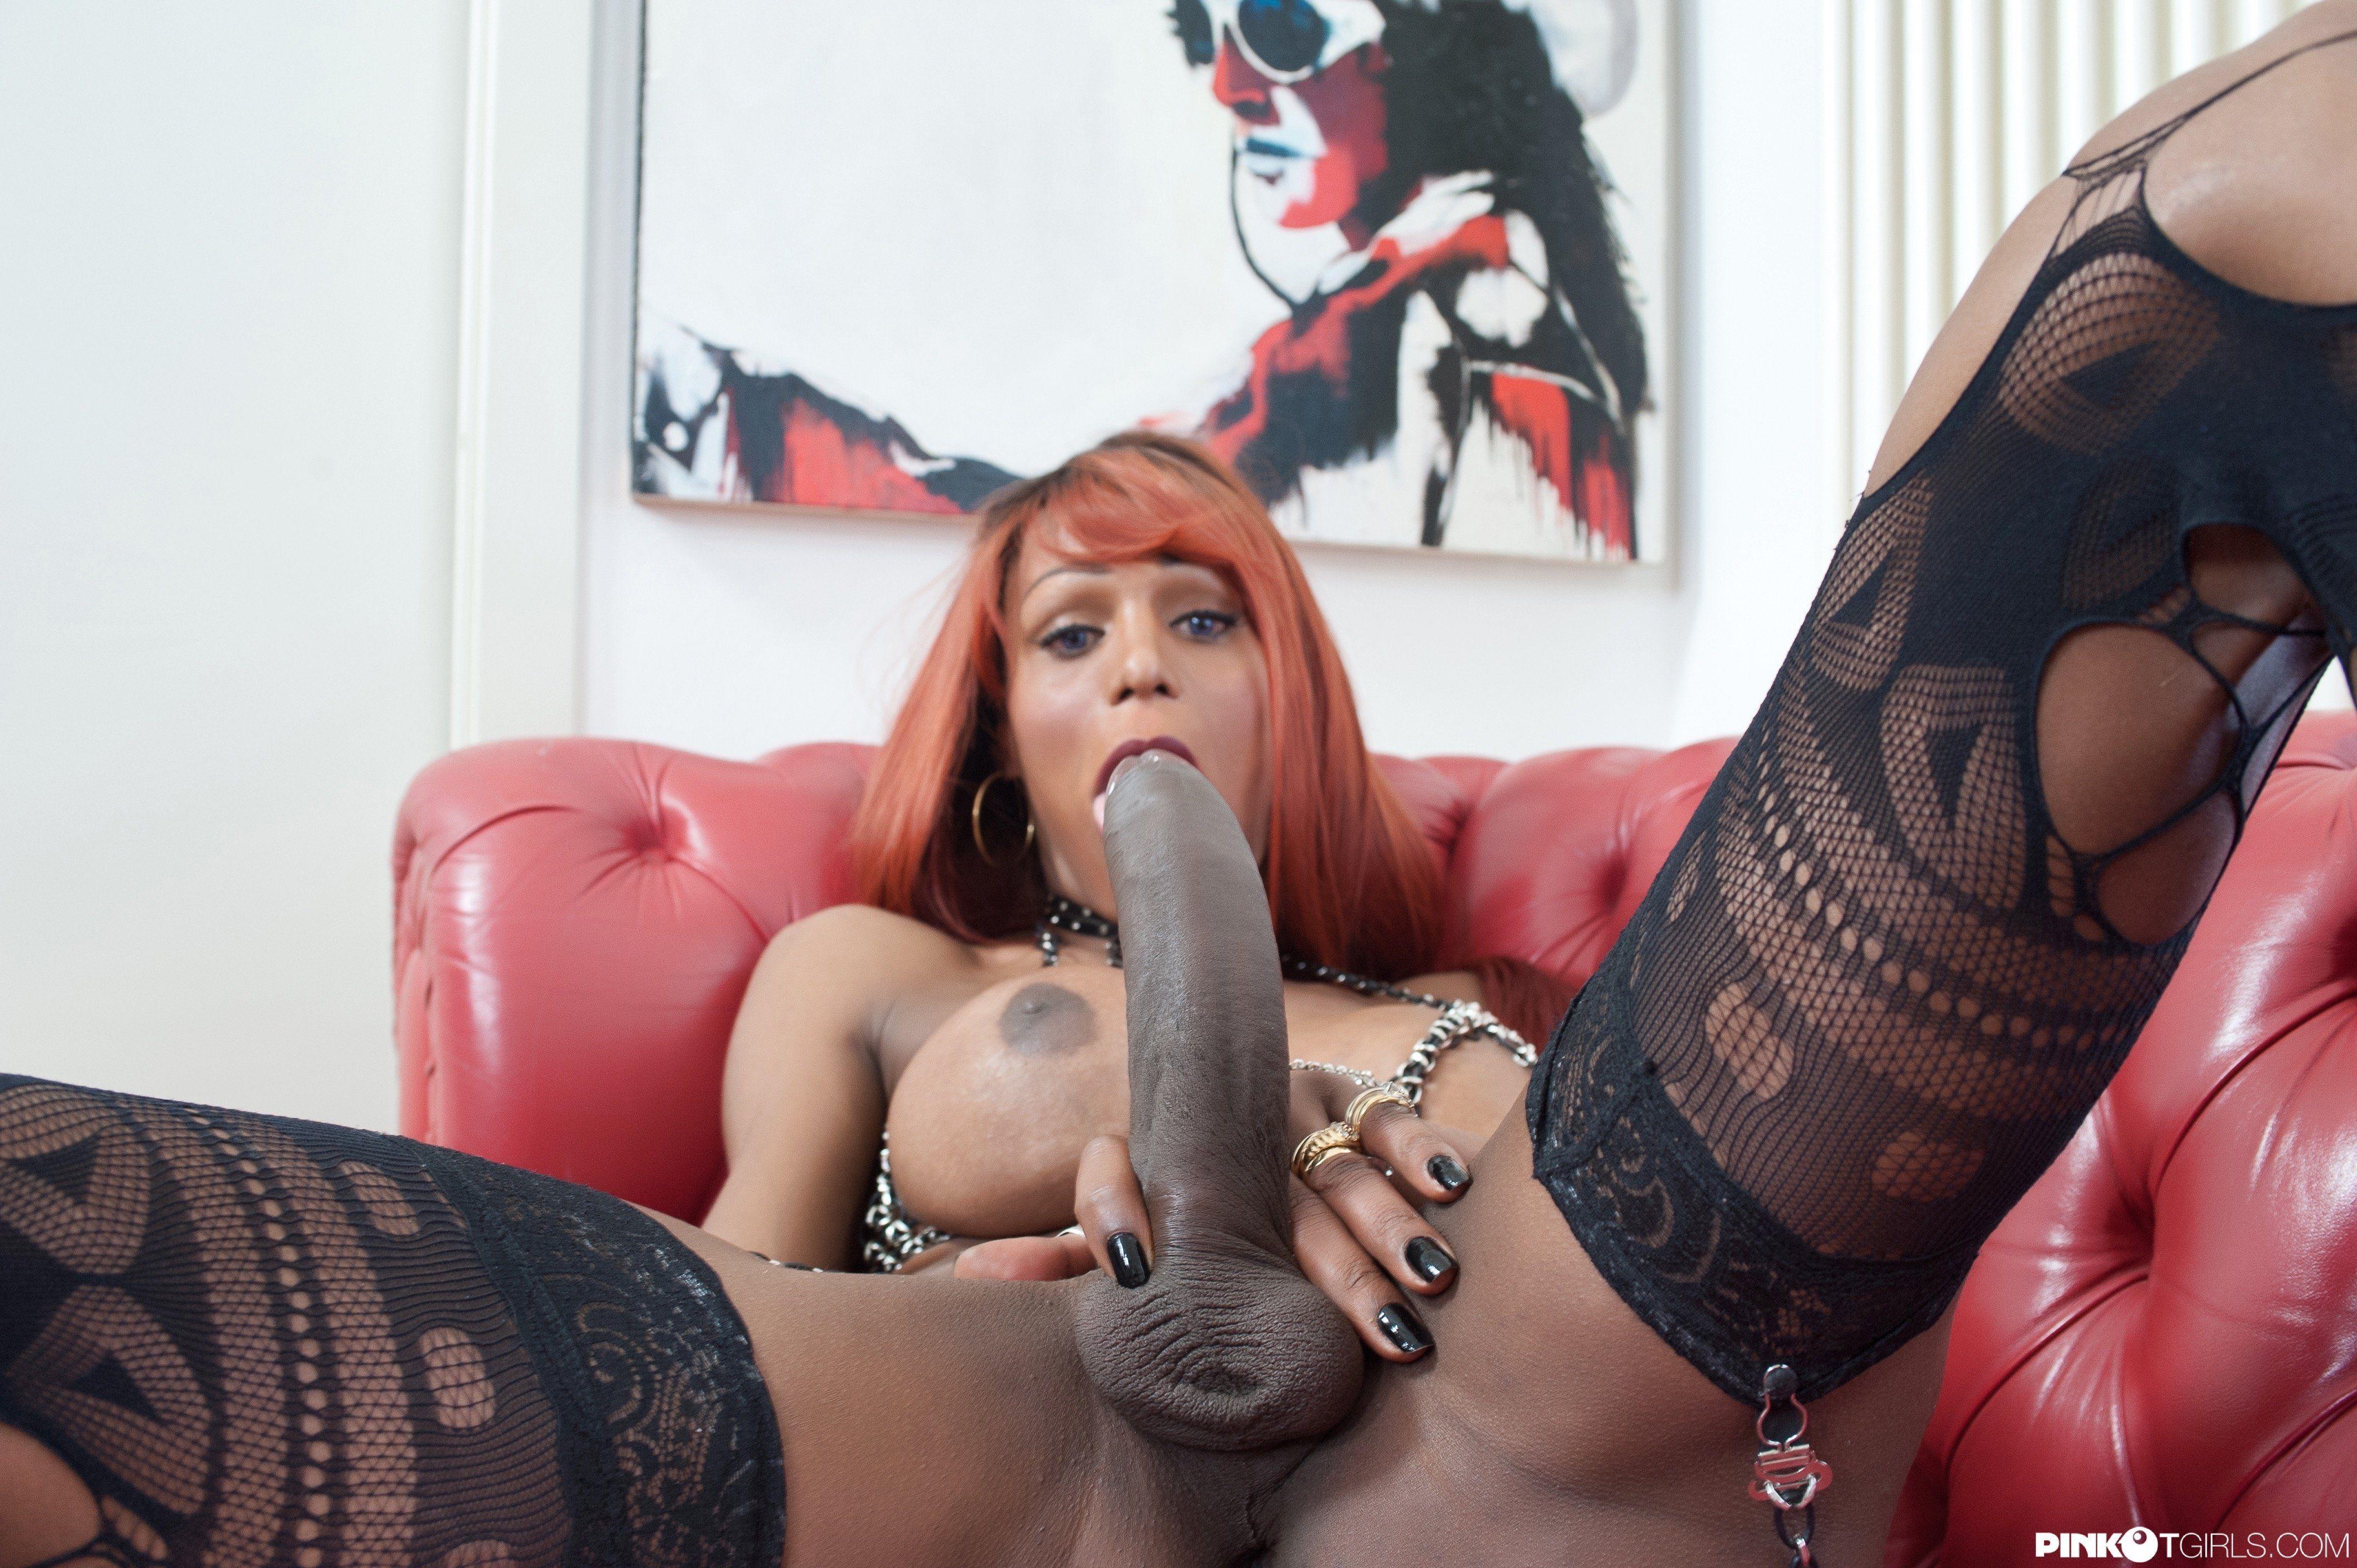 3 Shemales Having Sex monster shemales in females - porn tube.